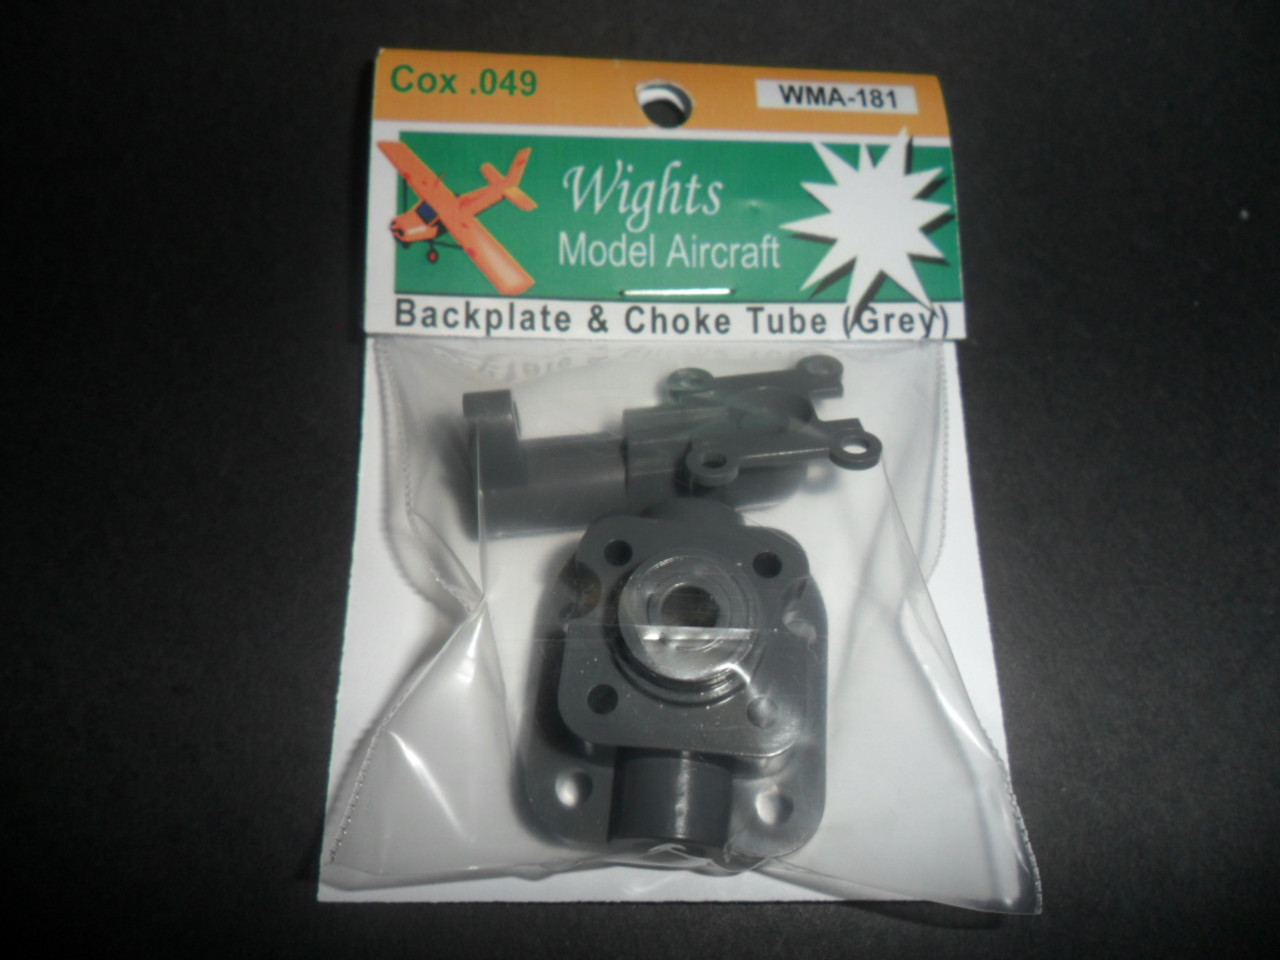 Backplate & Choke Tube - (WMA-181)